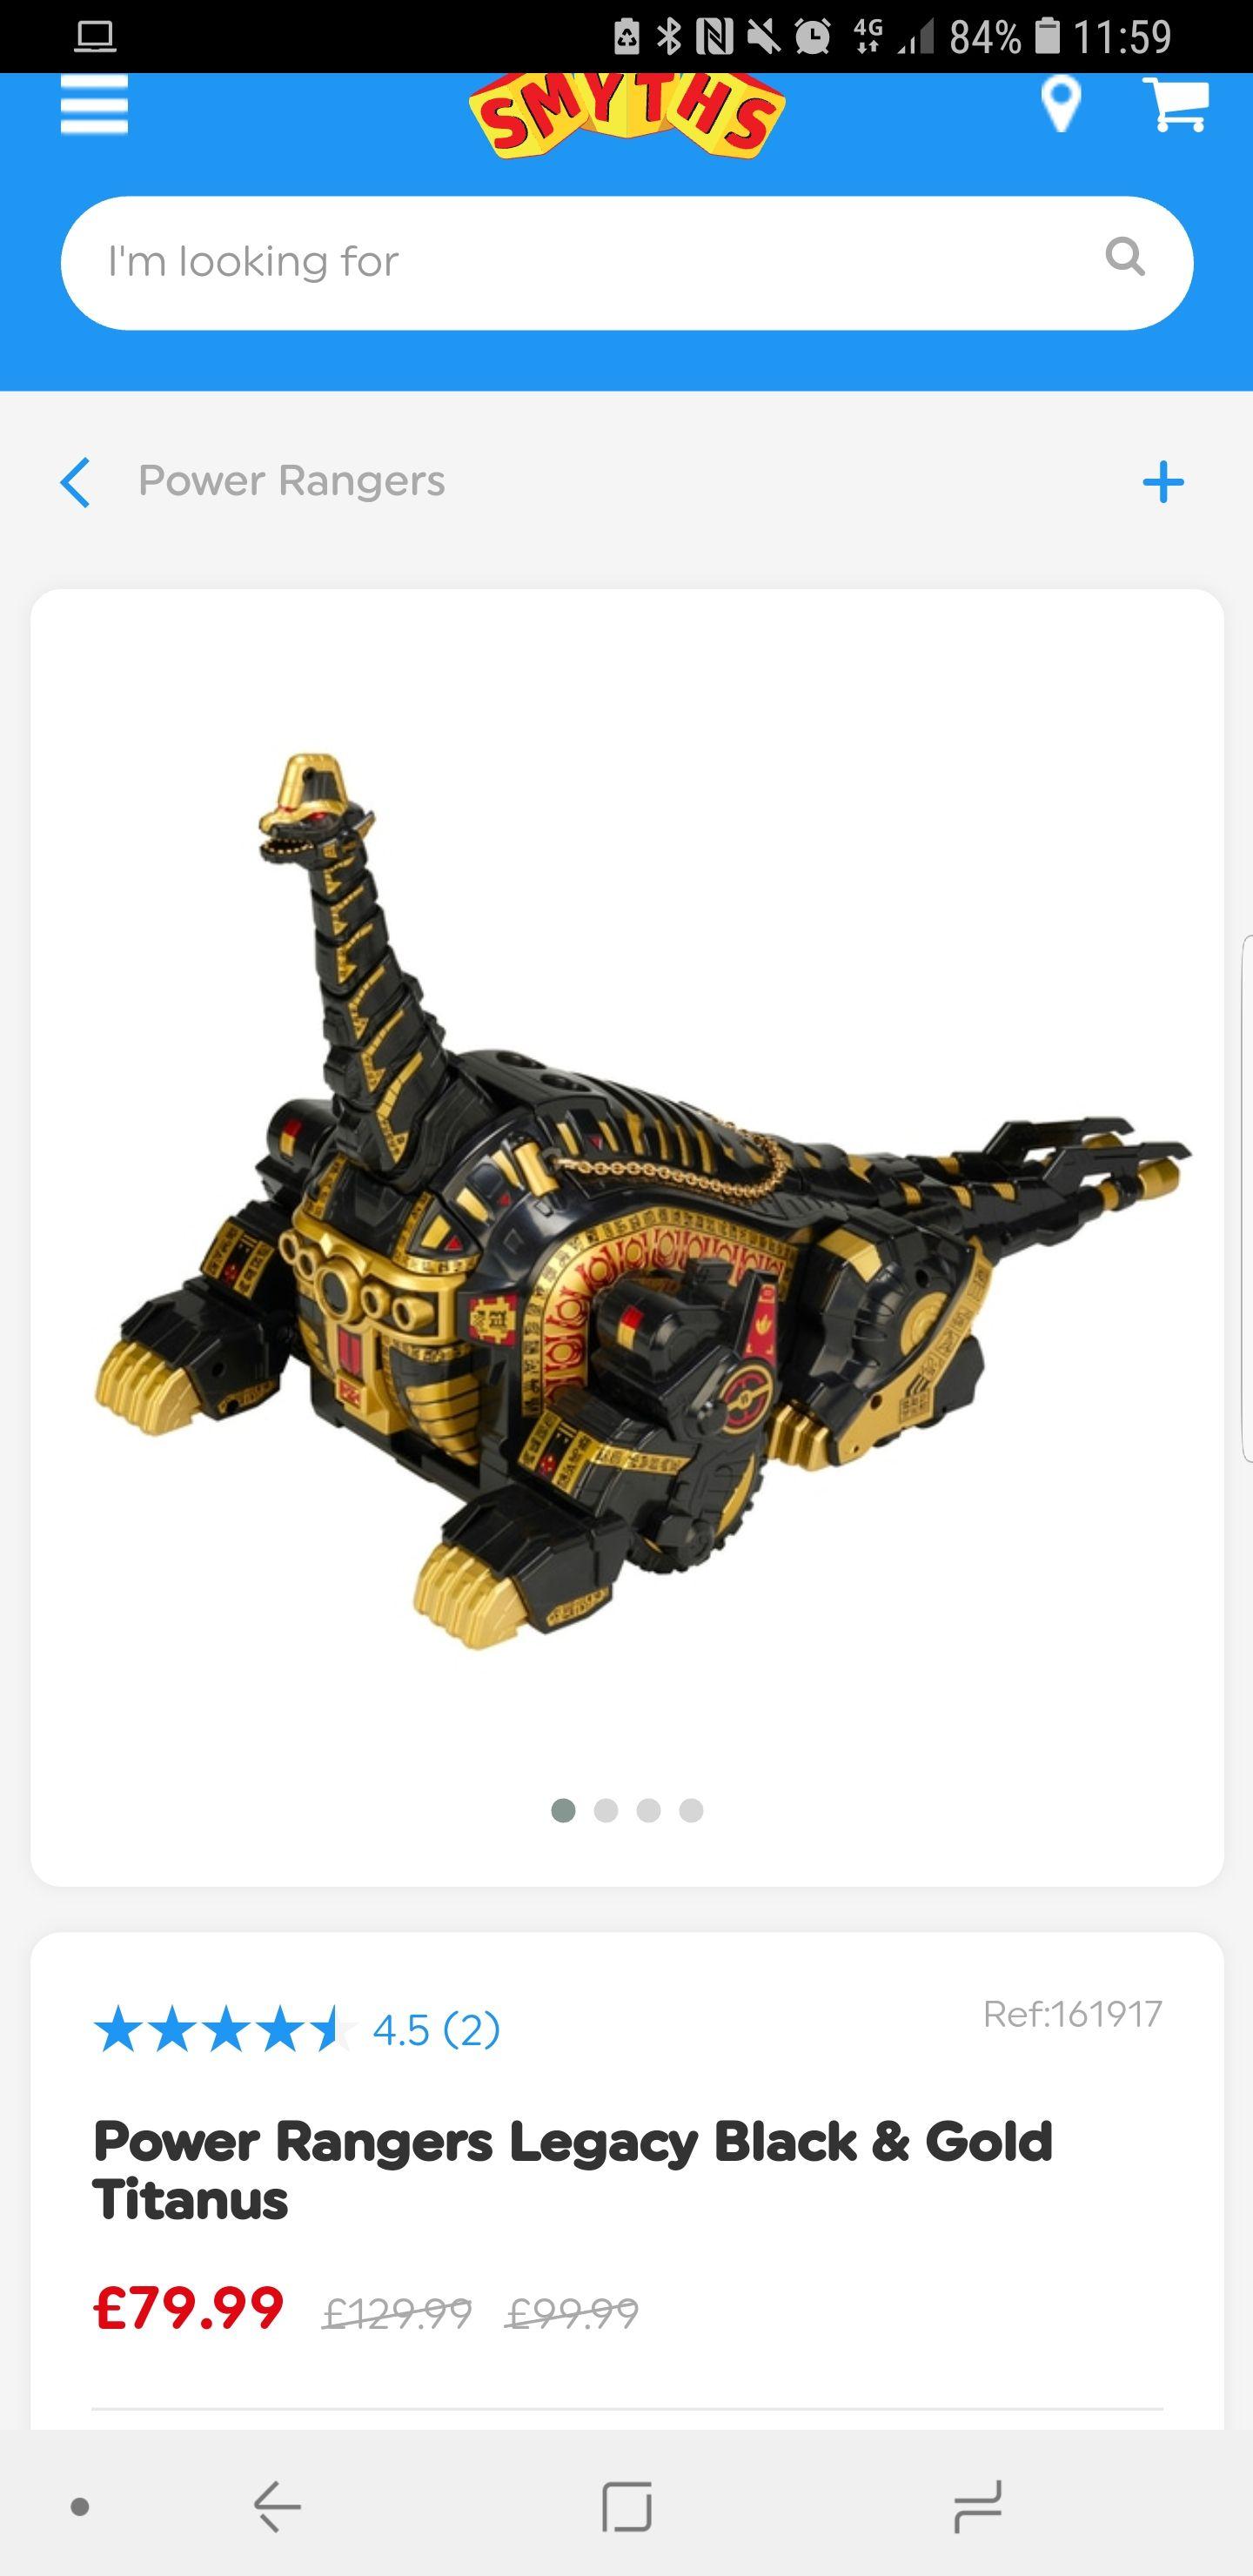 Power Rangers Legacy Titanus Black and Gold - £79.99 @ Smyths toys